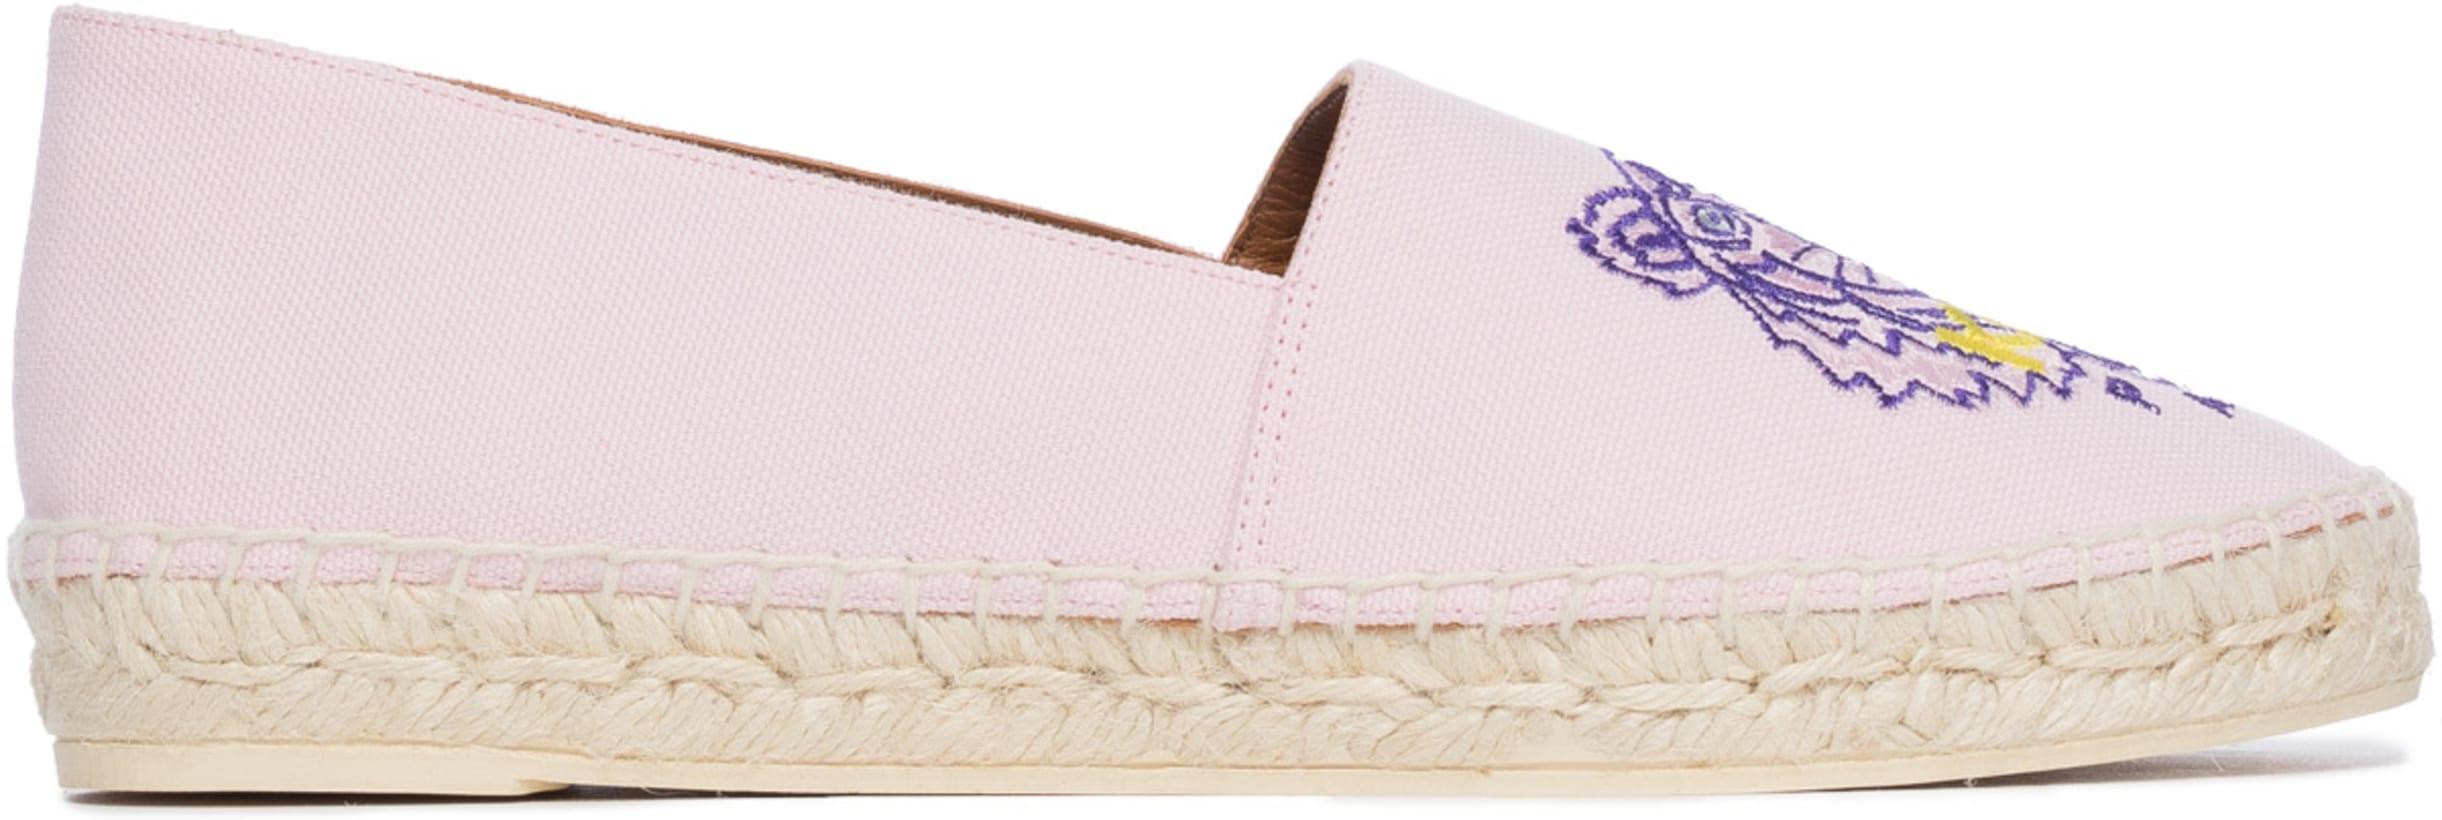 960982349 Kenzo: Tiger Espadrilles - Pink Flamingo   influenceu